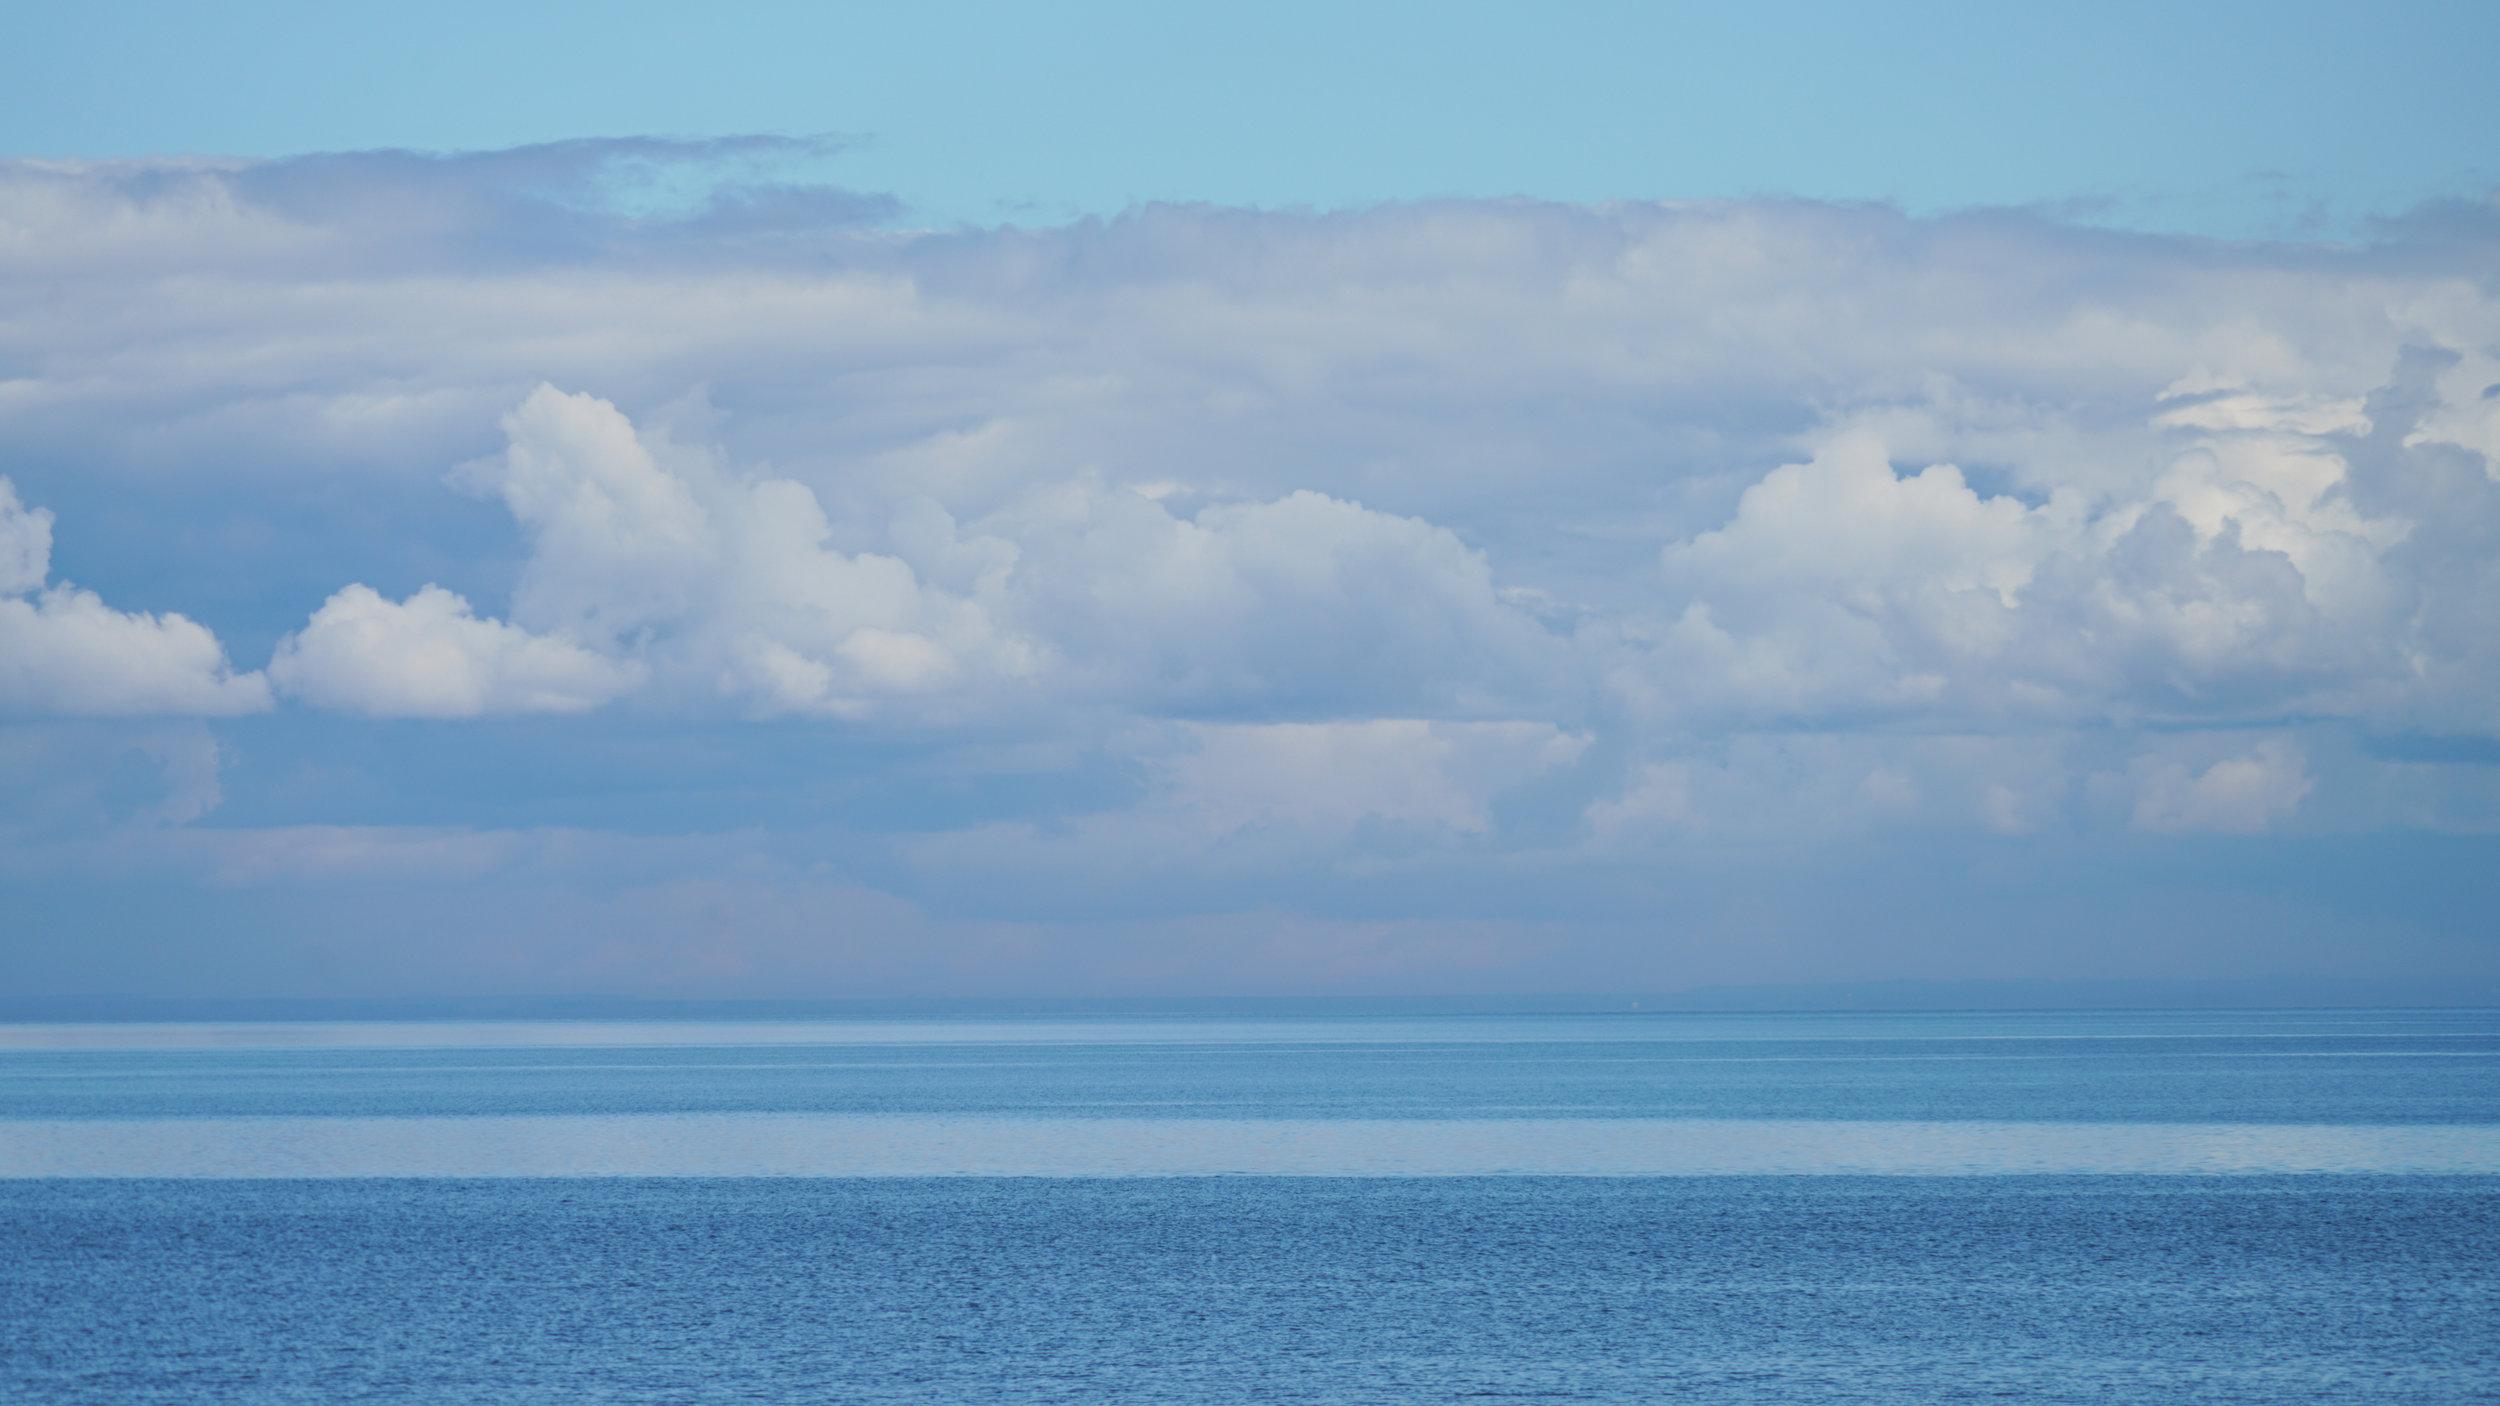 Nolan-Dubeau-Lora Bay-DSC00334.jpg